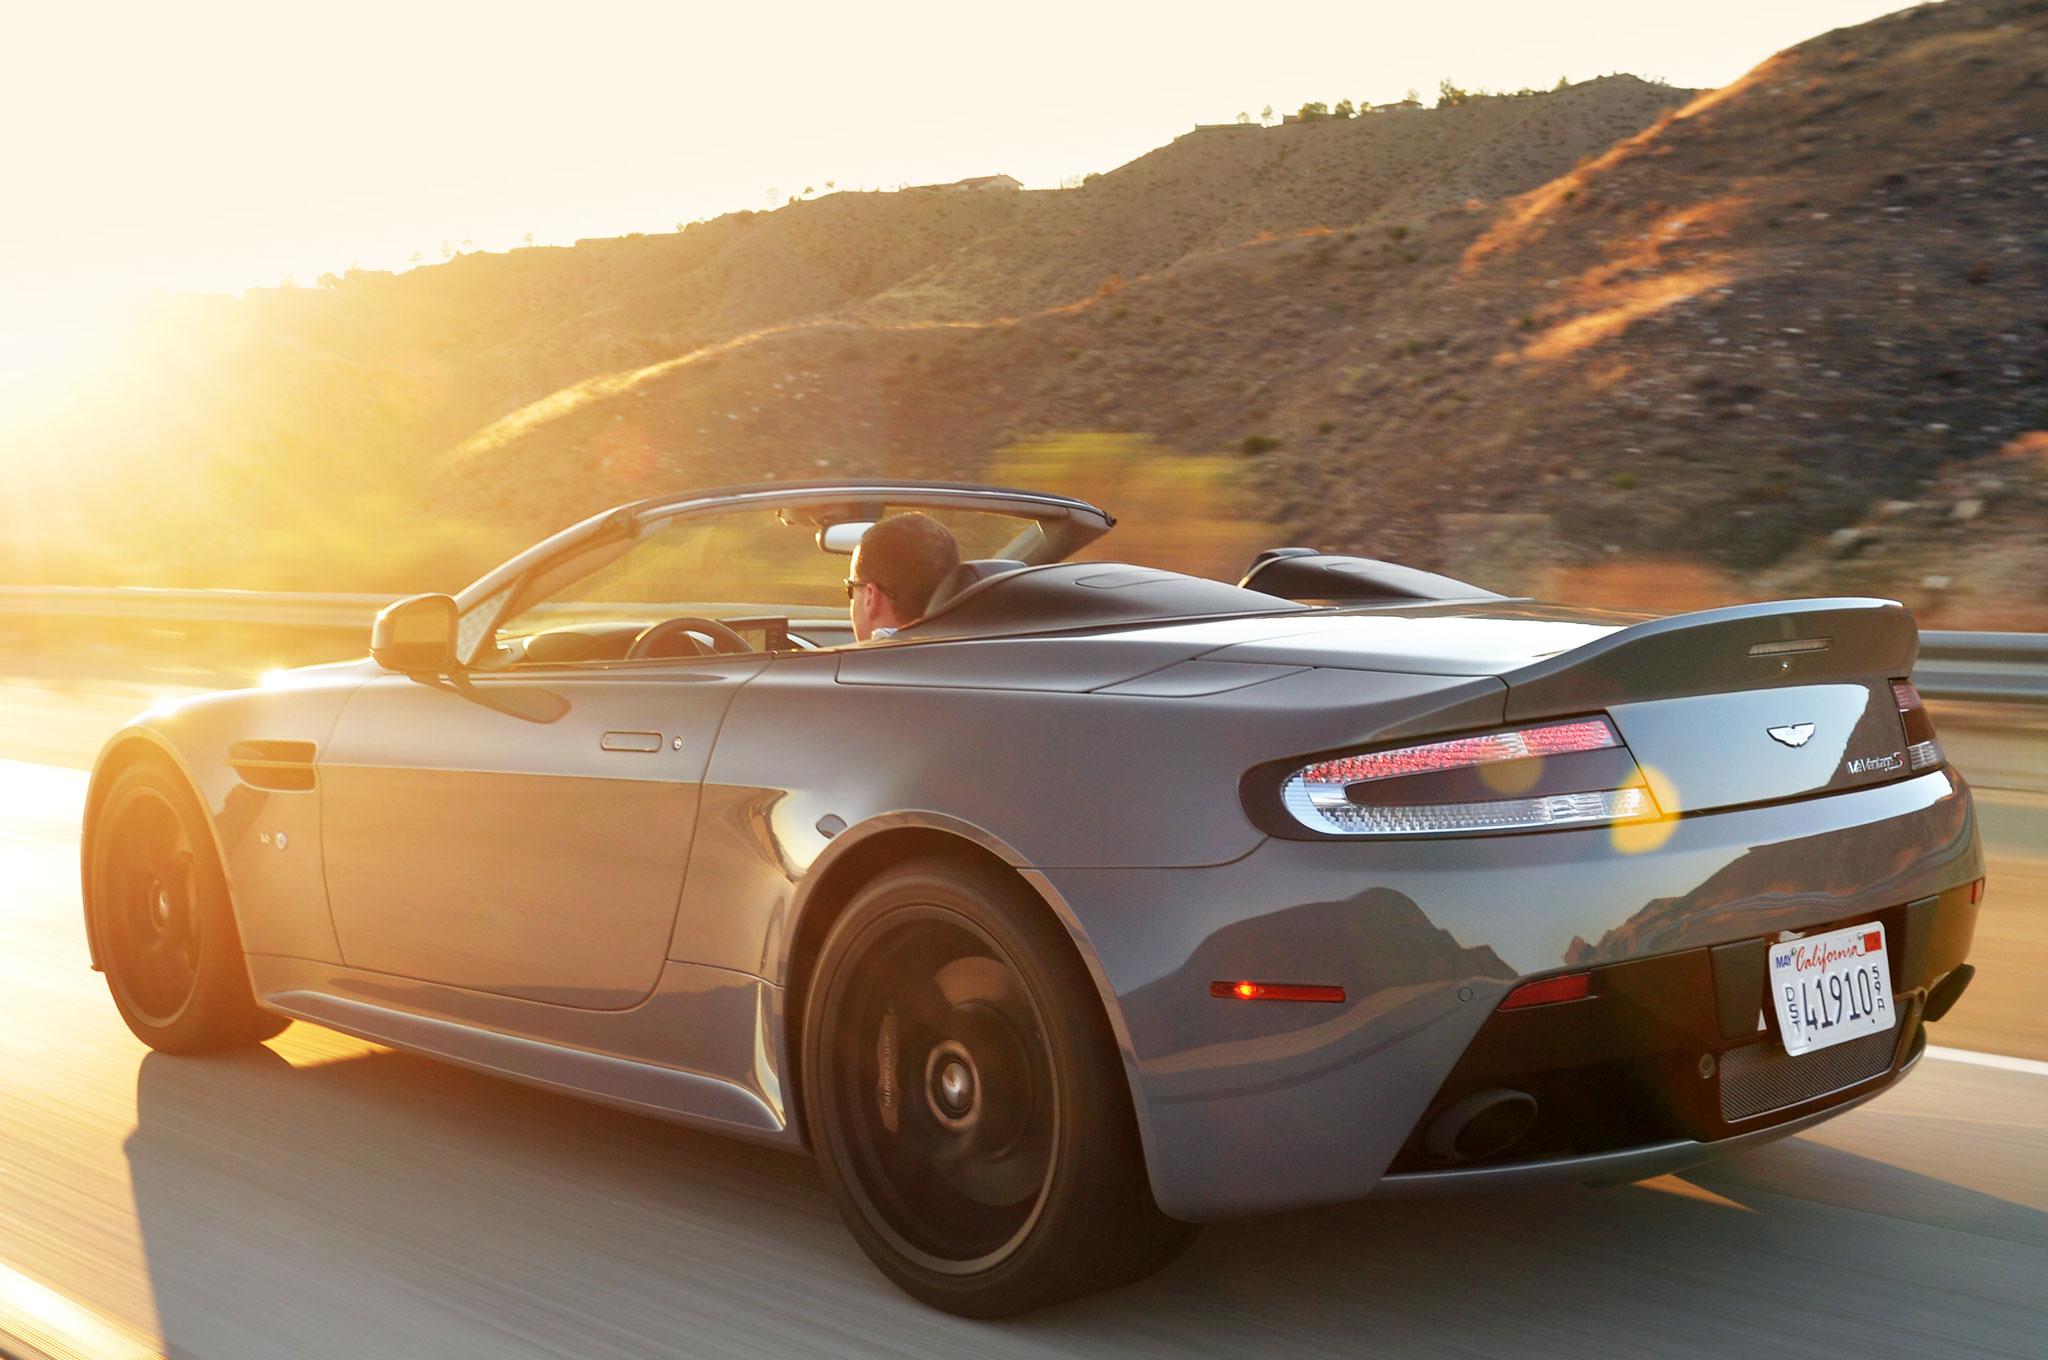 Aston Martin V Vantage S Roadster Rear Three Quarter View In Motion on Driven 2015 Aston Martin V12 Vantage S Roadster Review